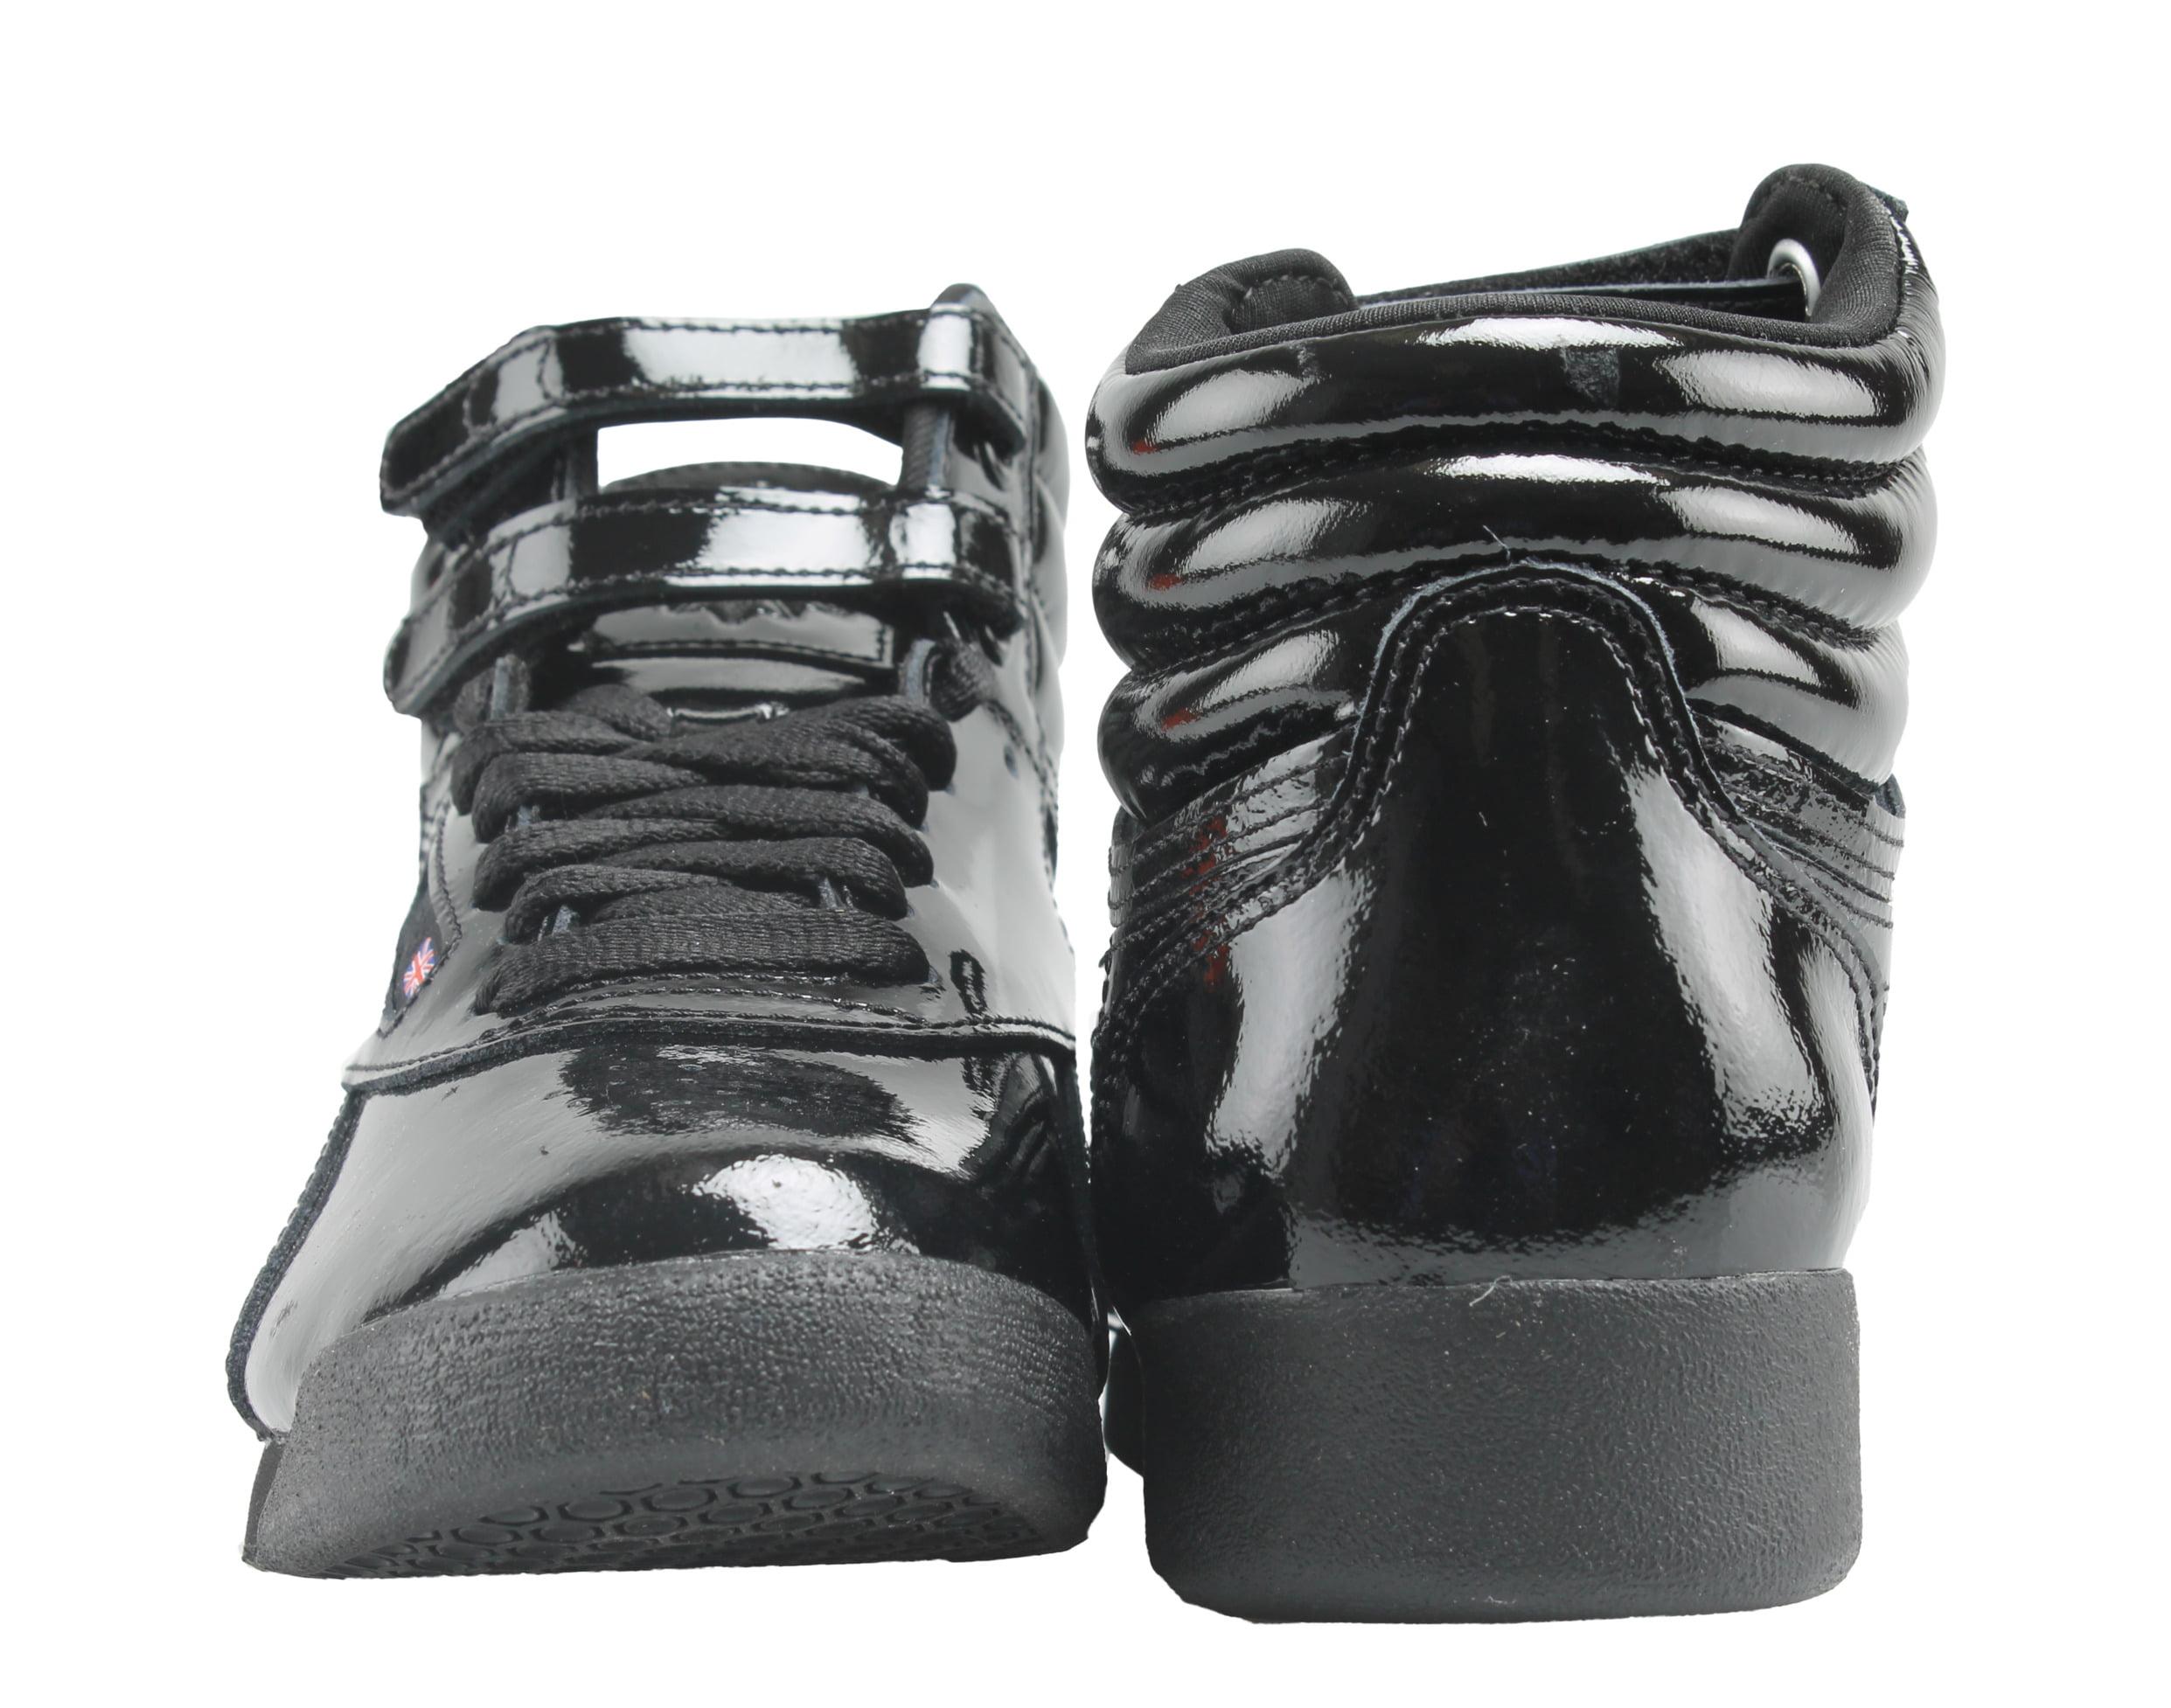 8bea2d12c20 Reebok - Reebok Classic Freestyle Hi Patent Black Womens Shoes CN2822 -  Walmart.com